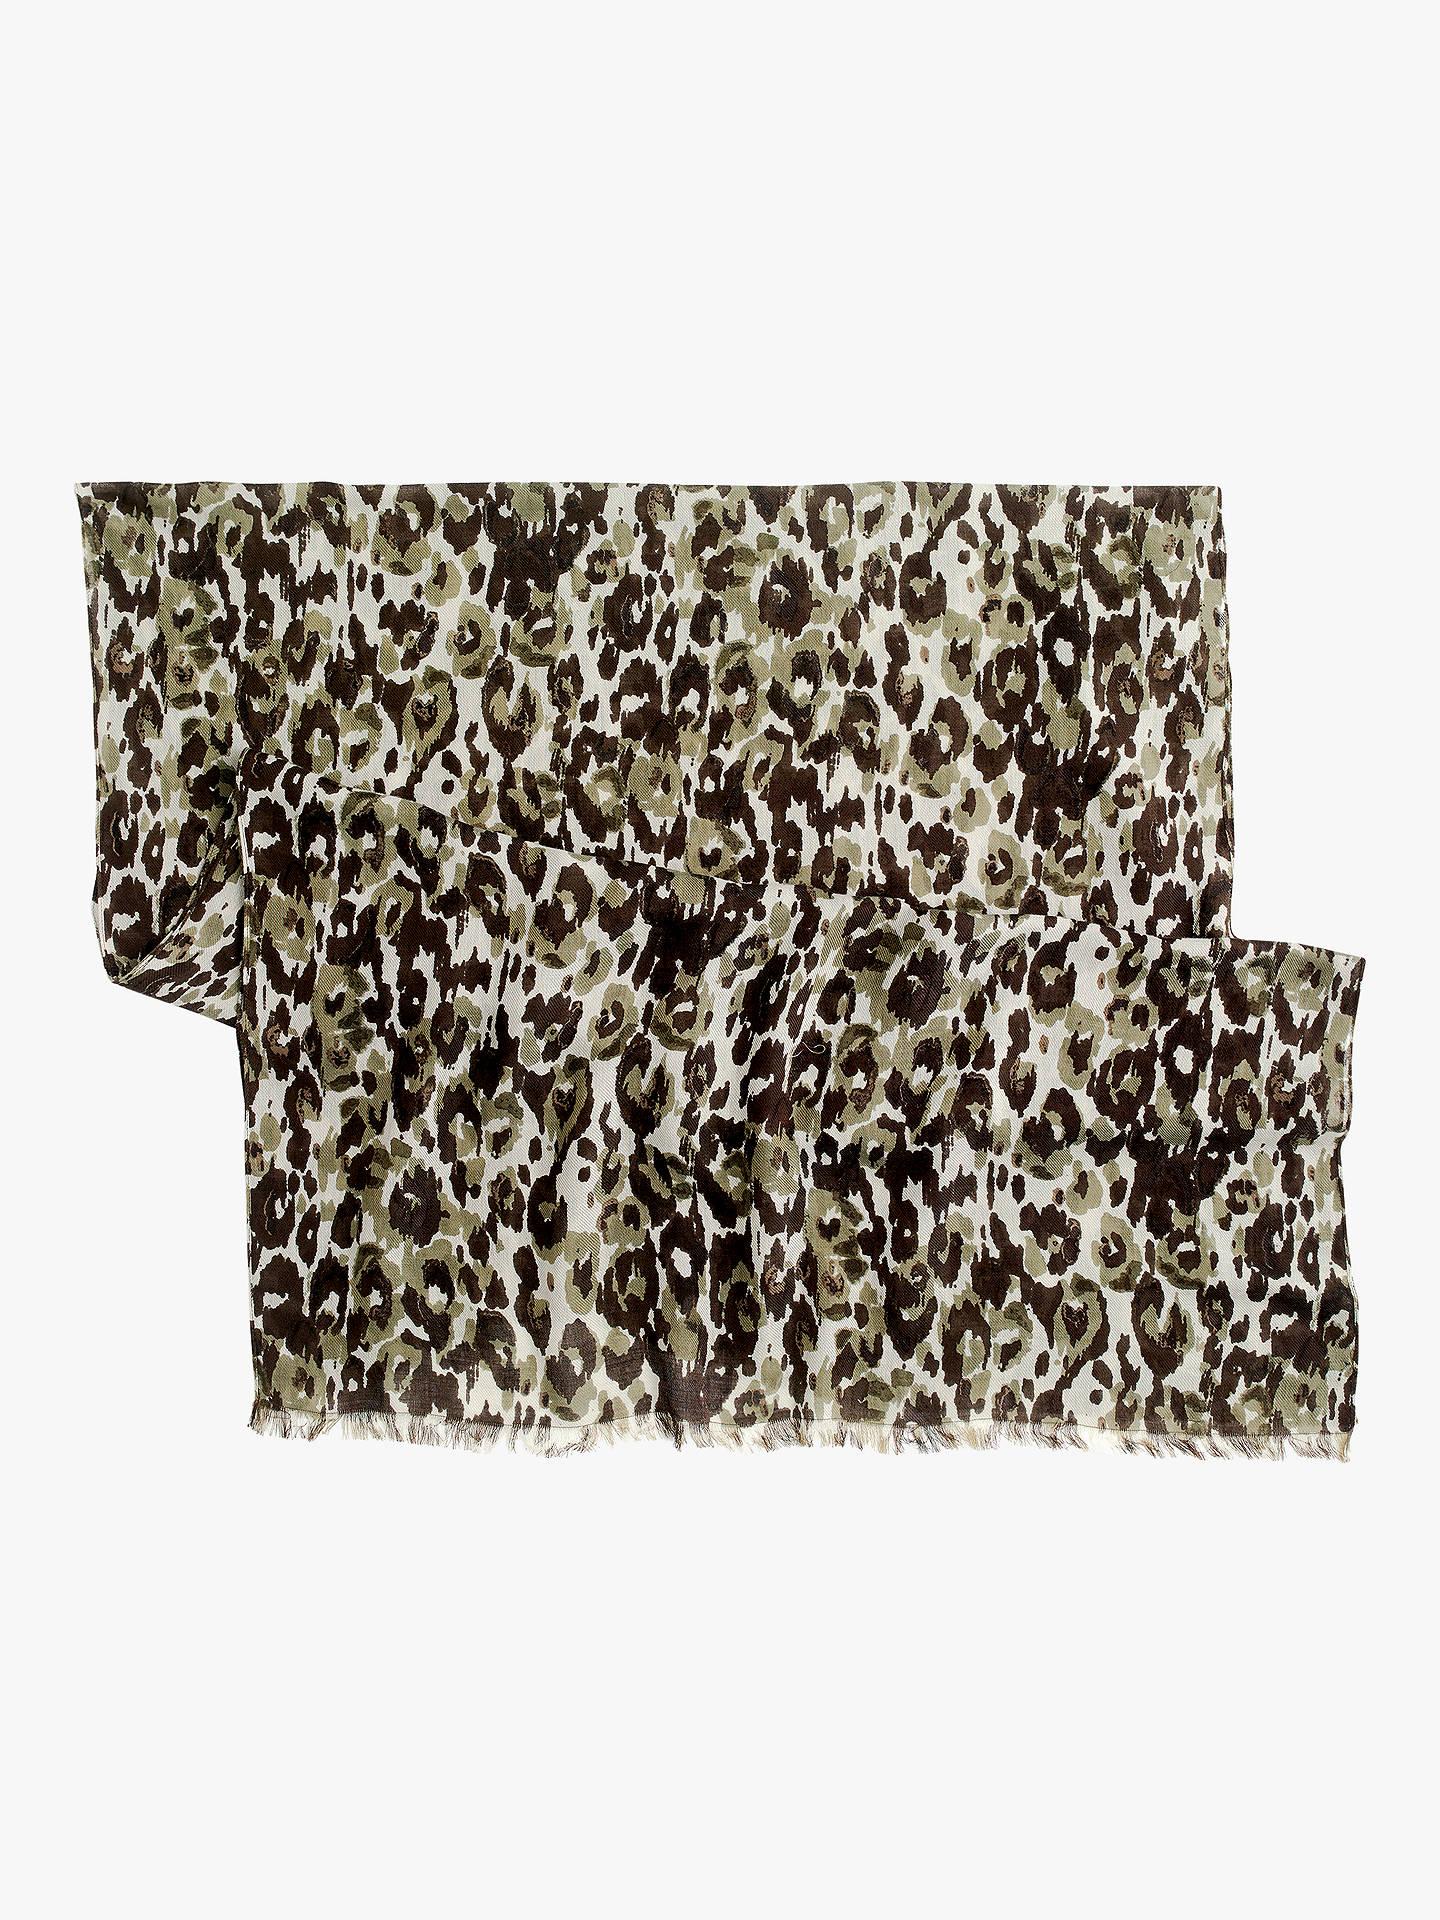 353528aa1997a ... Buy J.Crew Leopard Scarf, Autumn Cheetah Online at johnlewis.com